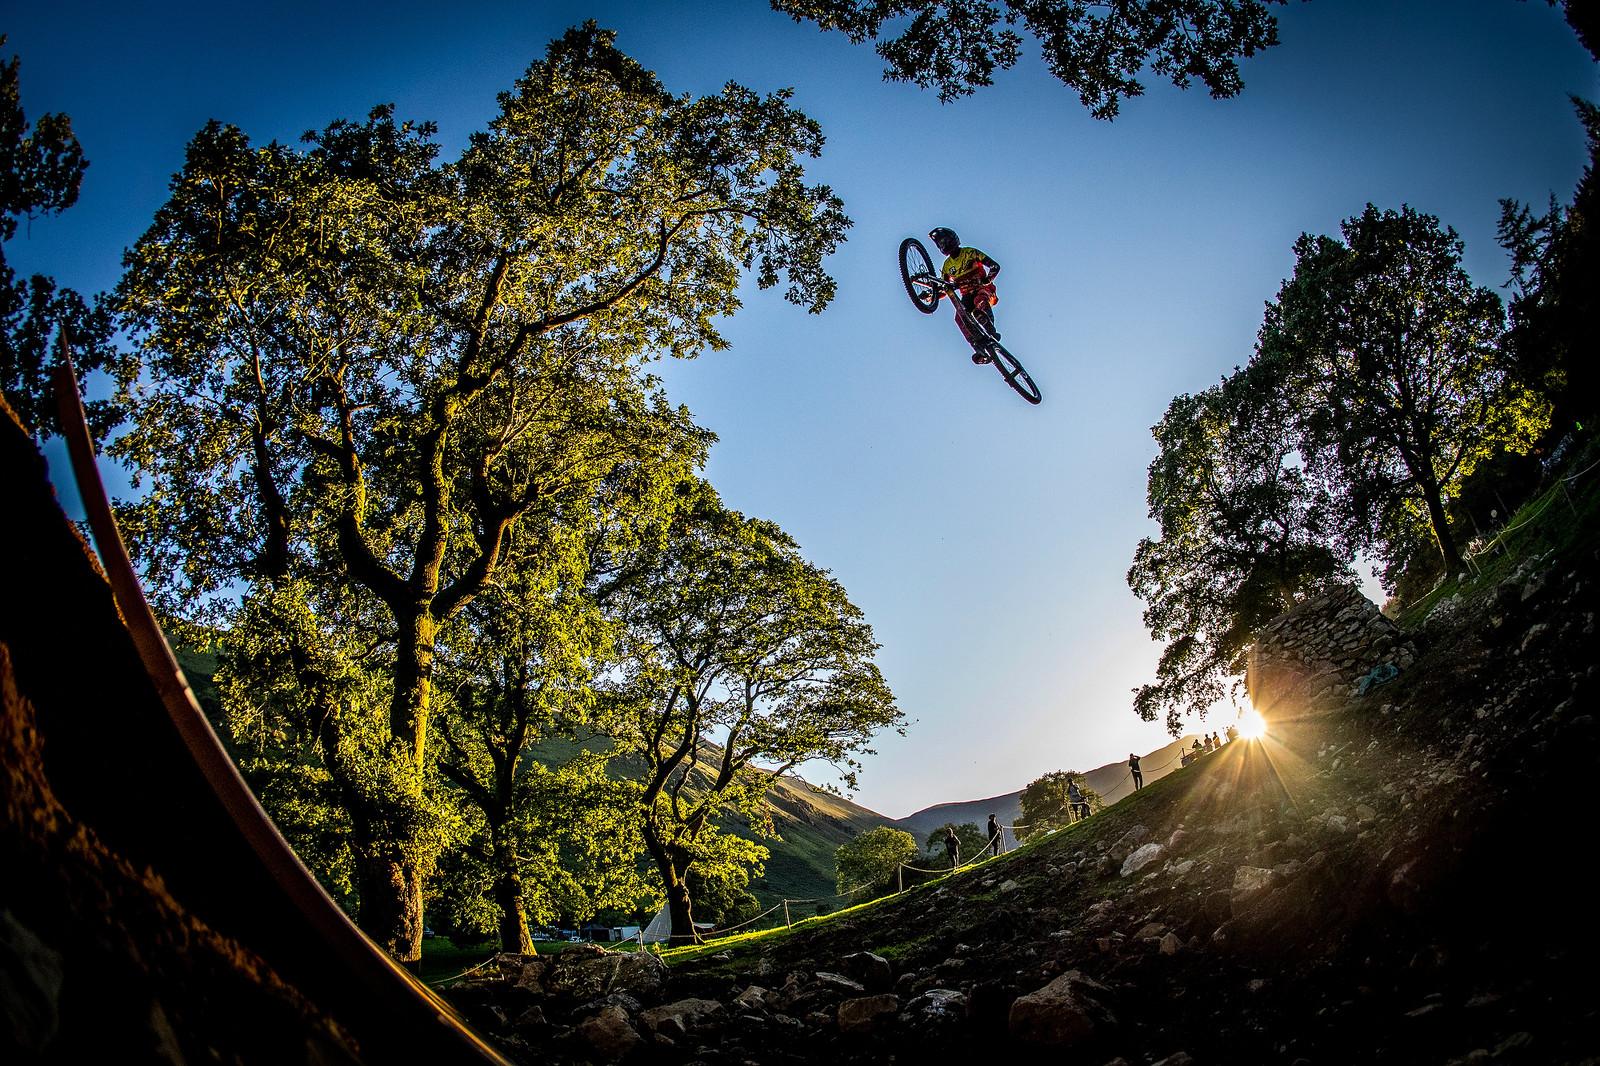 Finsh Gap Insanity - BIG AIR PHOTO BLAST - RED BULL HARDLINE - Mountain Biking Pictures - Vital MTB